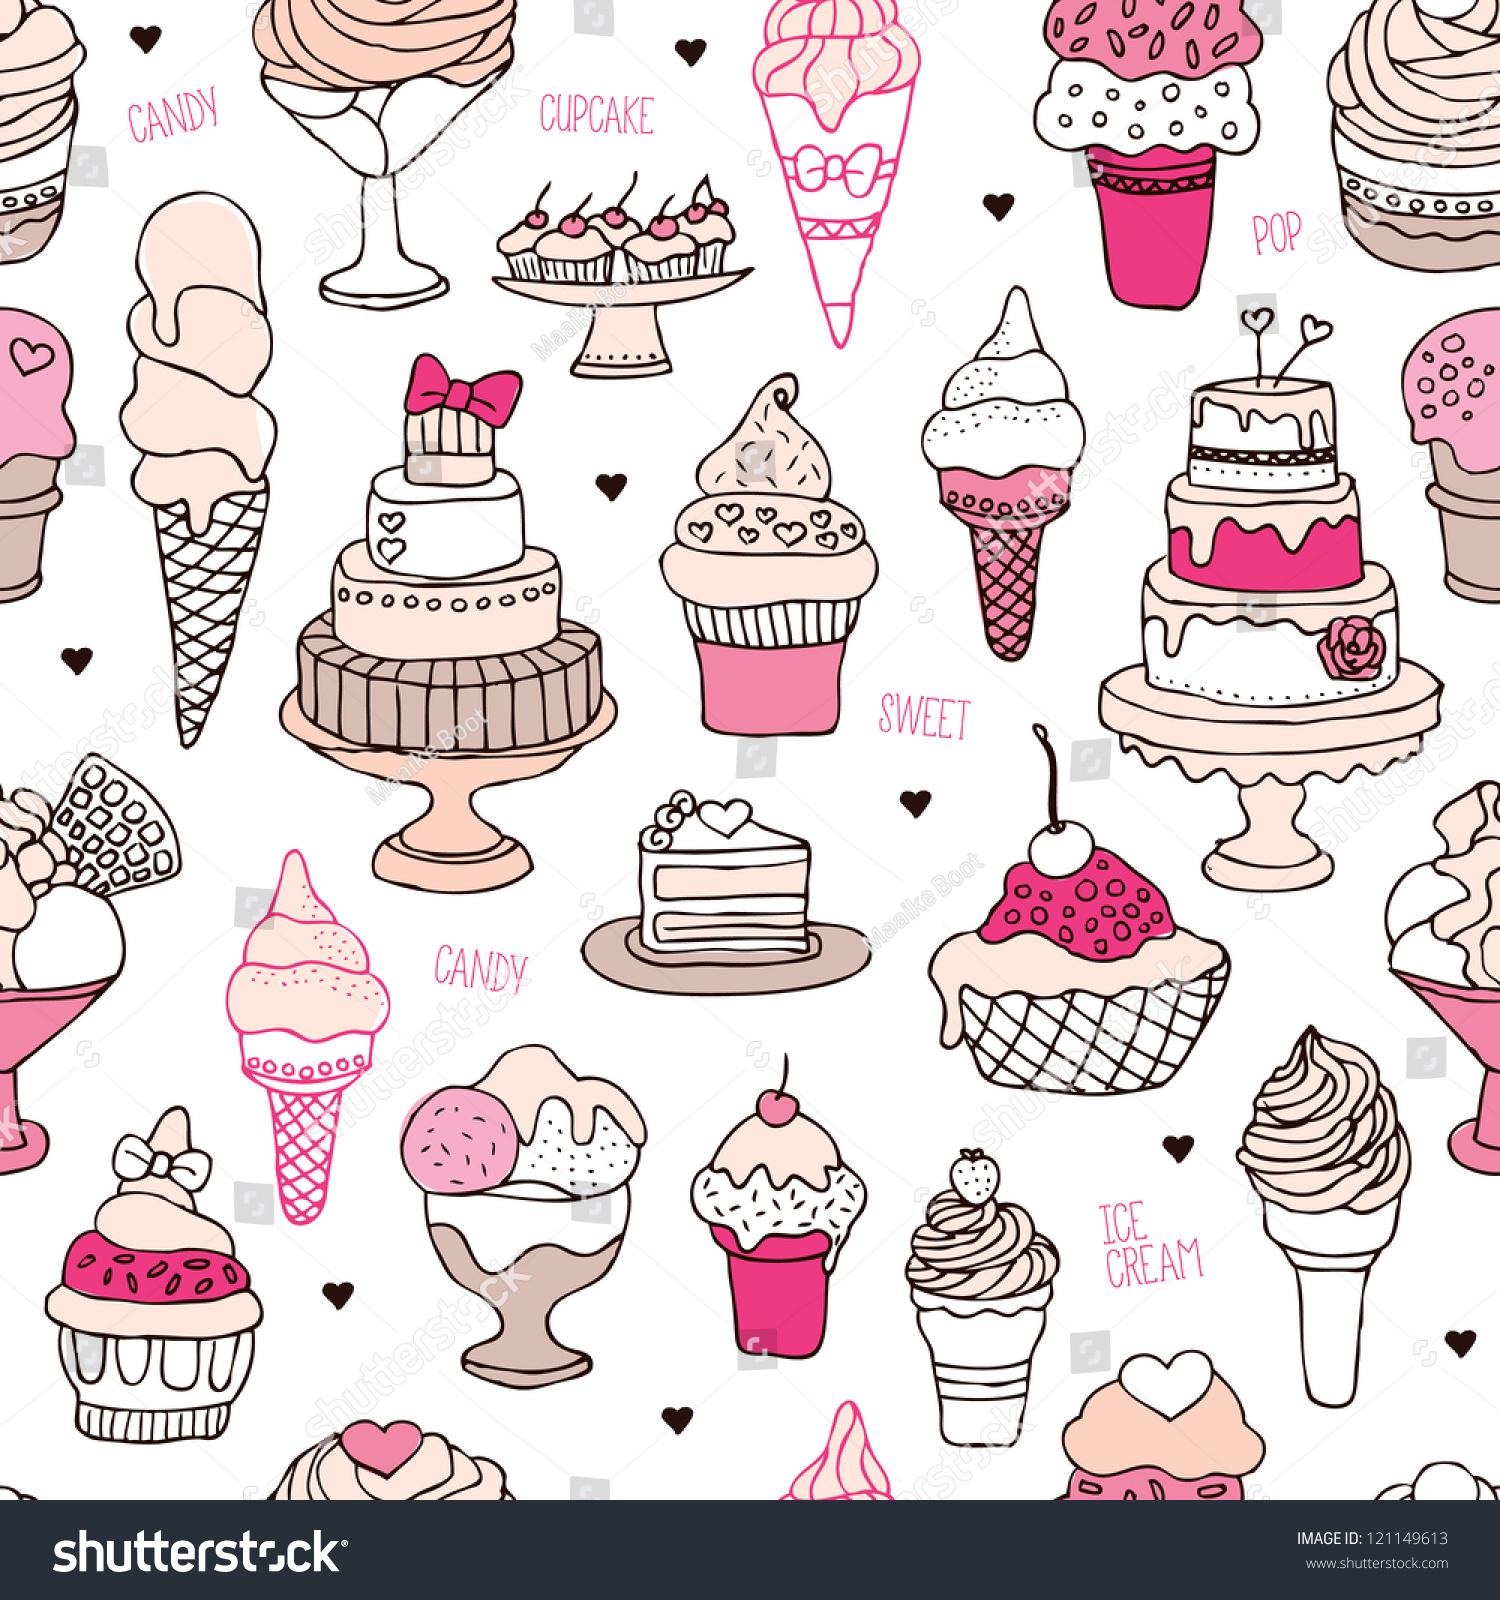 Seamless Ice Cream Background: Seamless Ice Cream Candy Cake Background ���วกเตอร์สต็อก